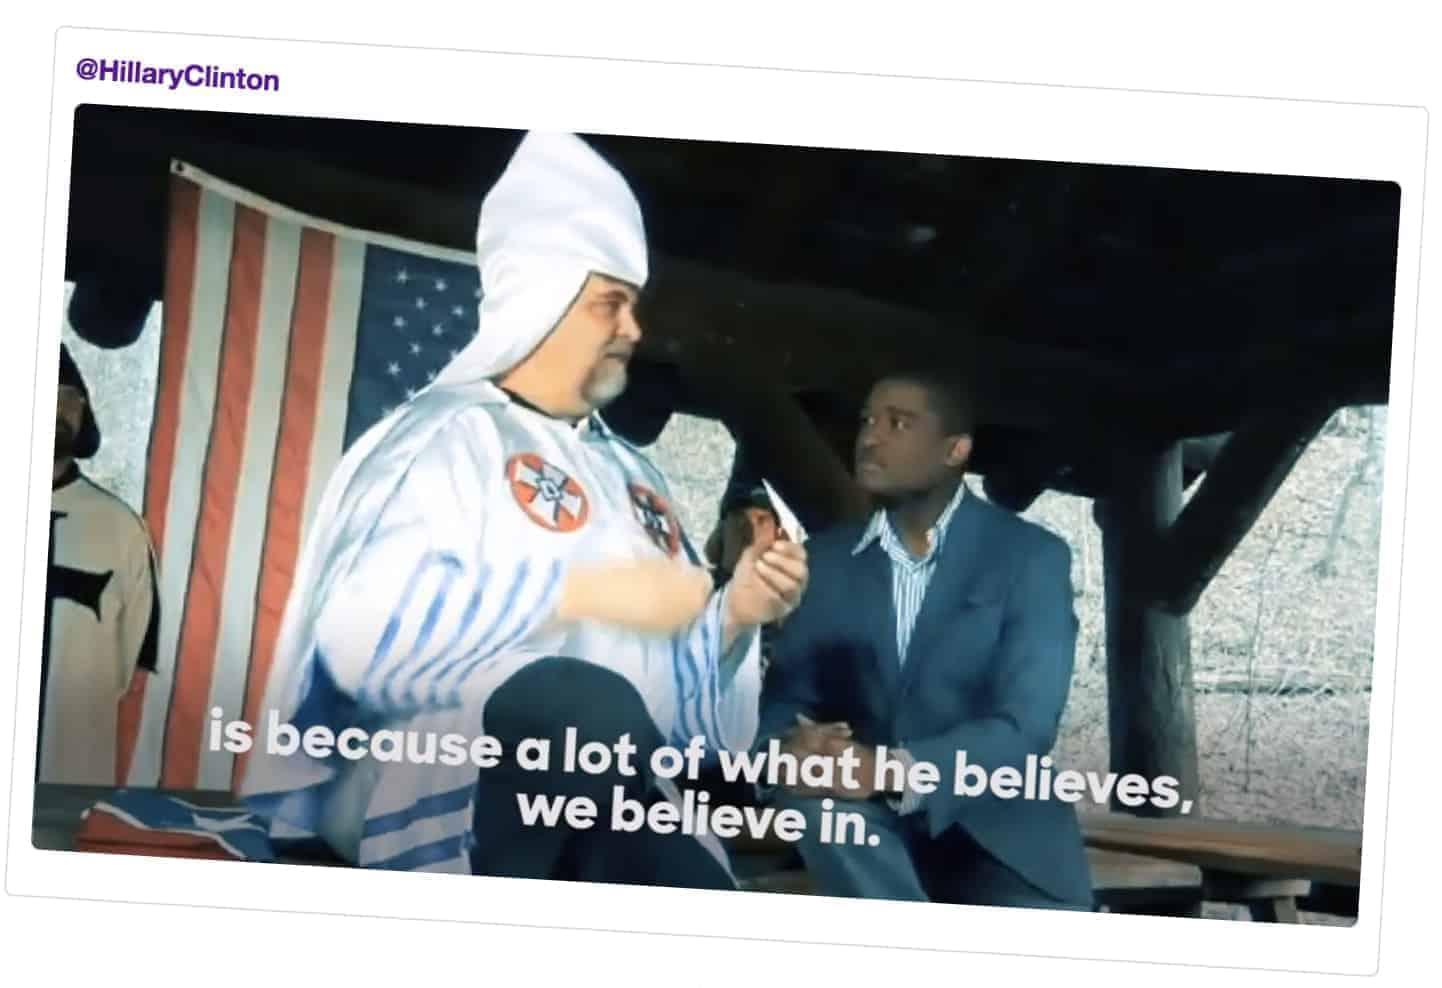 (Faksimile: Hillaryclinton.com)